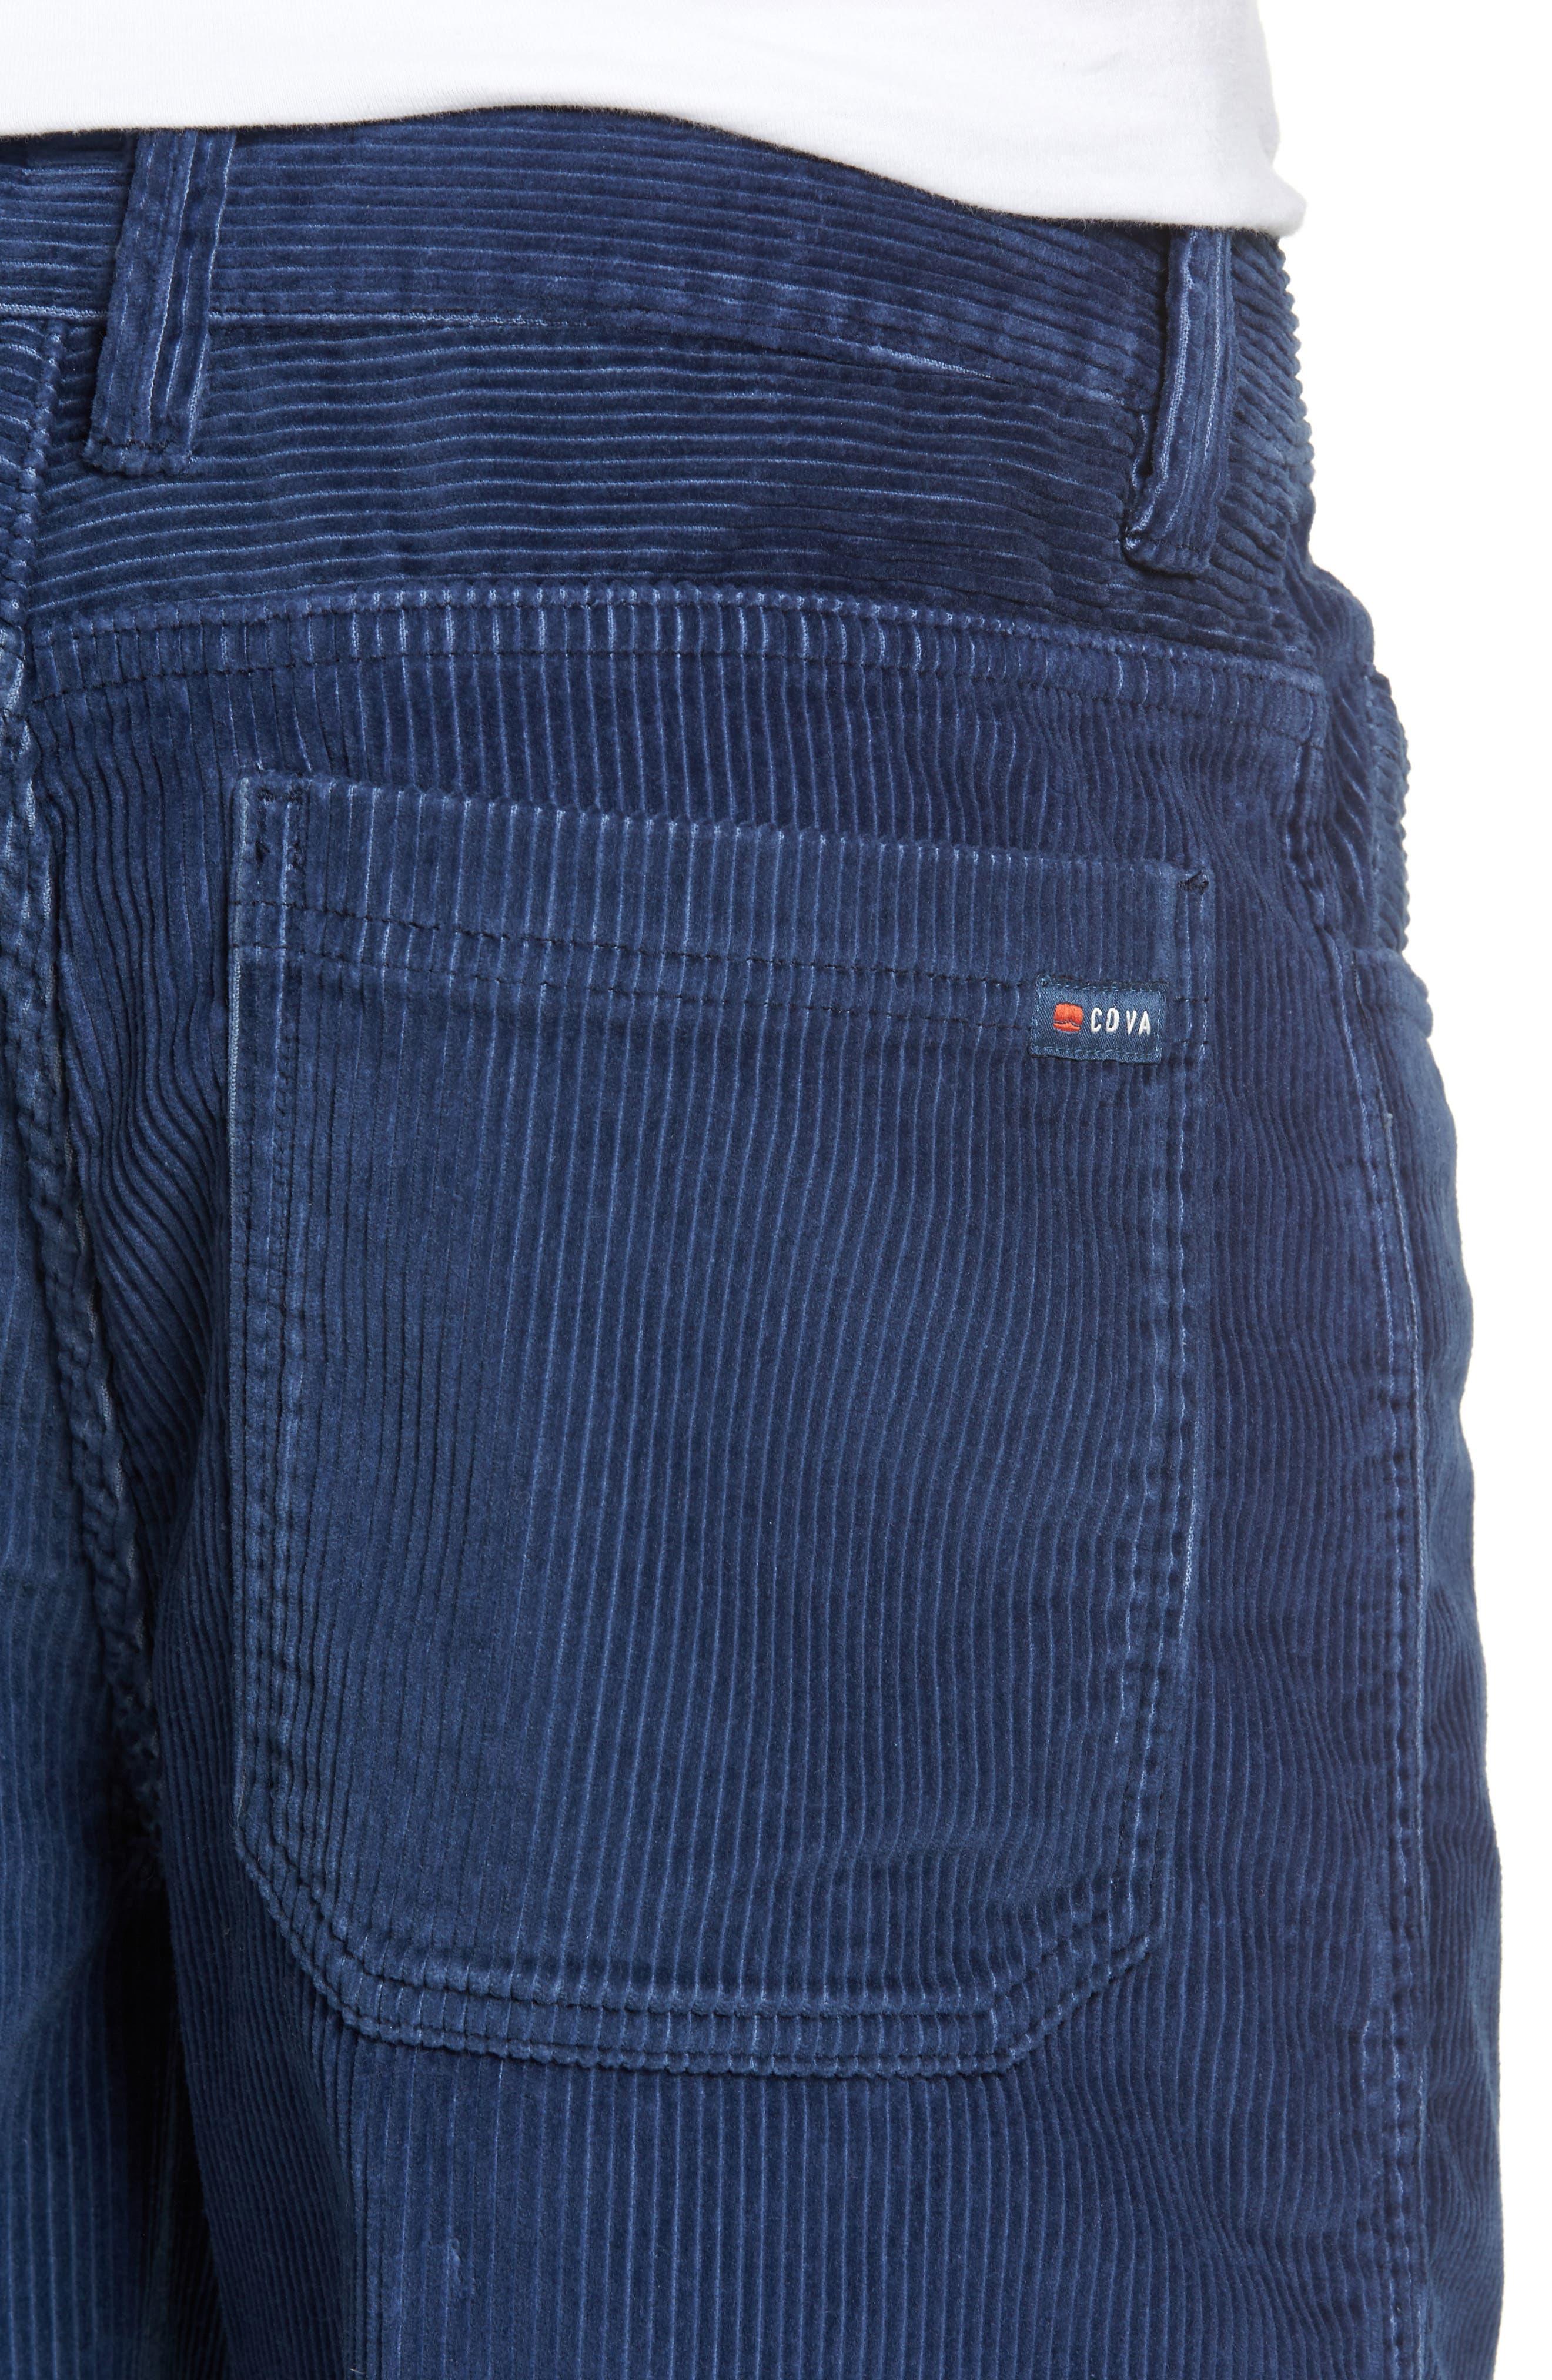 Kordo Corduroy Walking Shorts,                             Alternate thumbnail 4, color,                             410